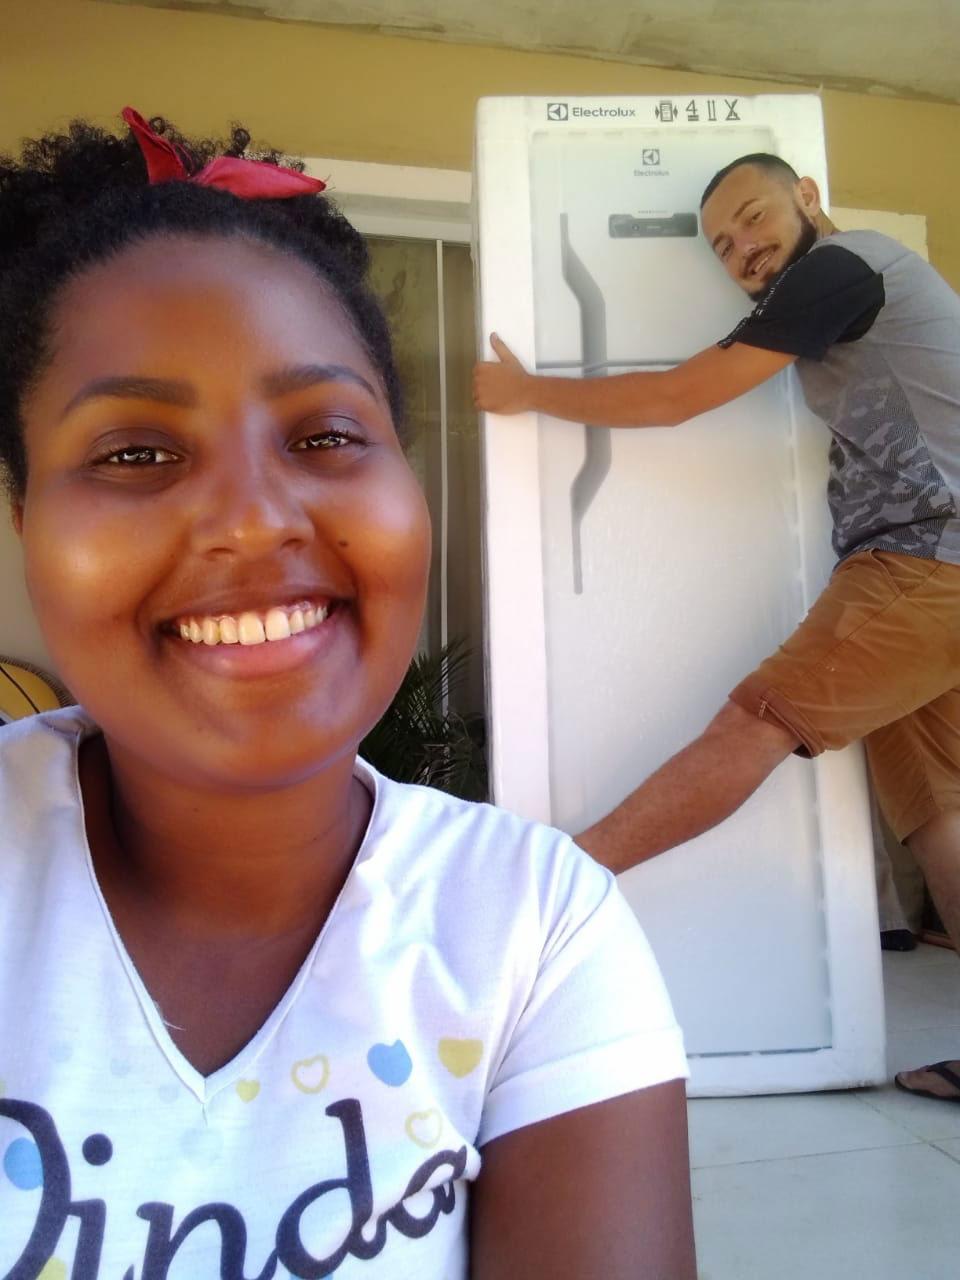 selfie casal geladeira electrolux